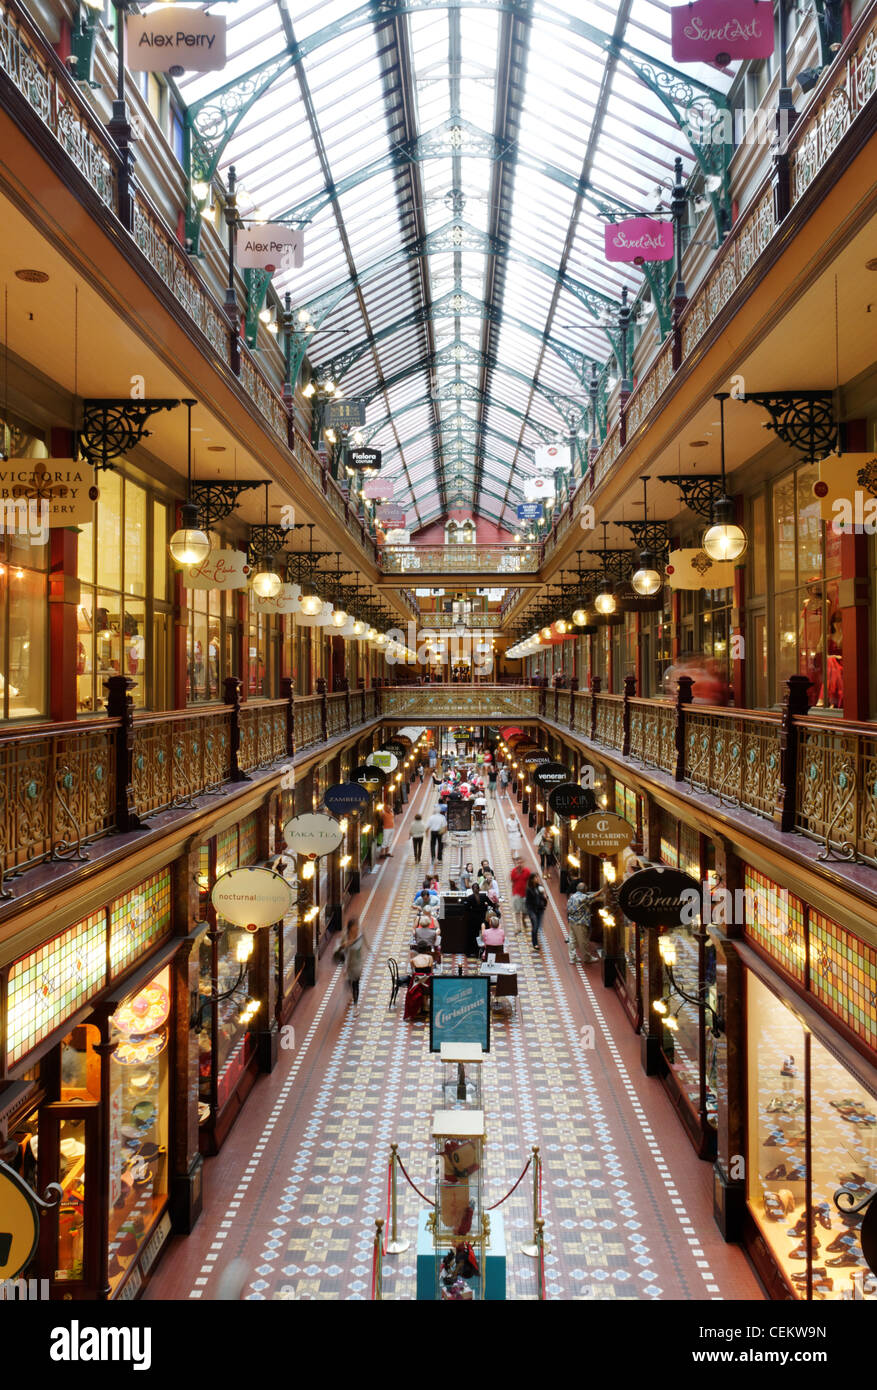 sydney street london shops opening - photo#31